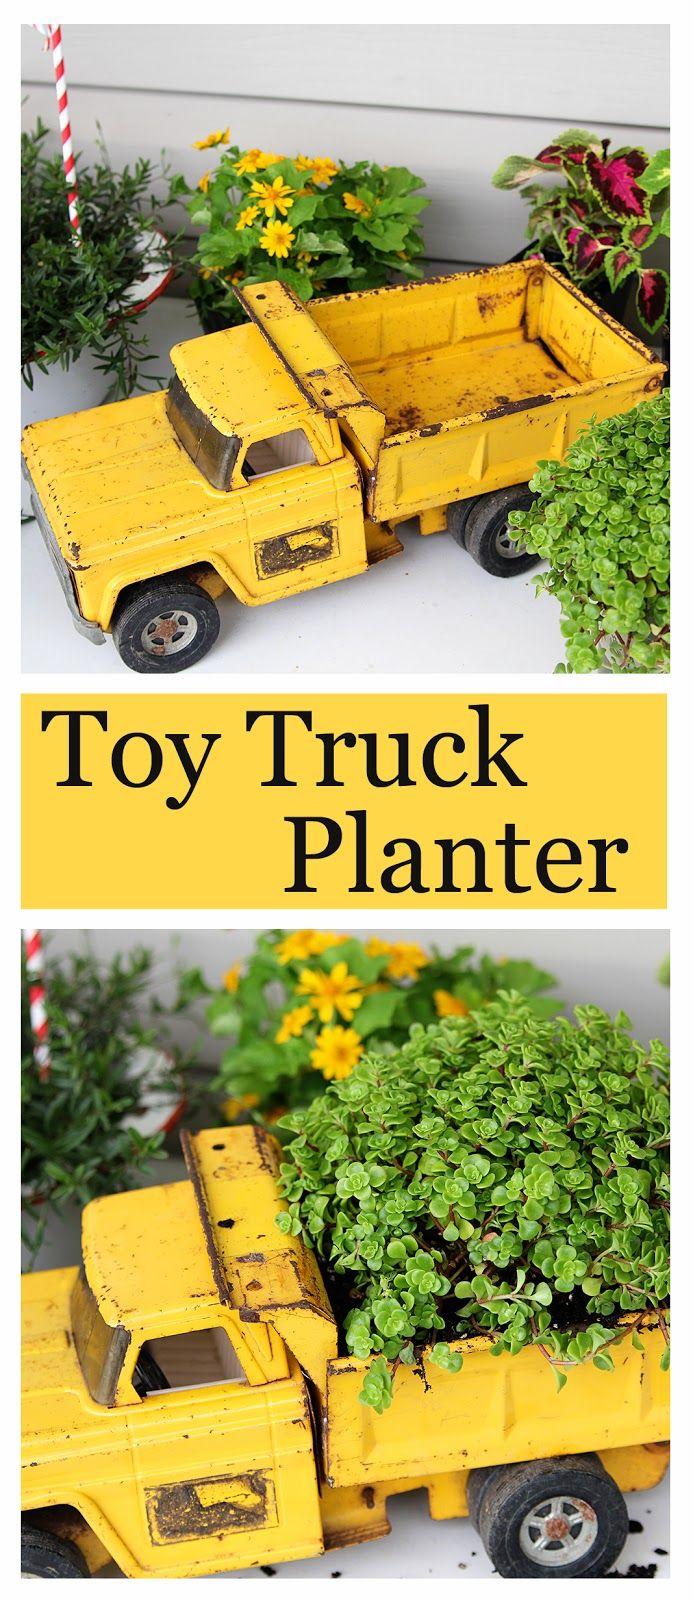 Keep On Trucking: Fun Upcycled Planter Idea | Toy trucks, Yard sale ...